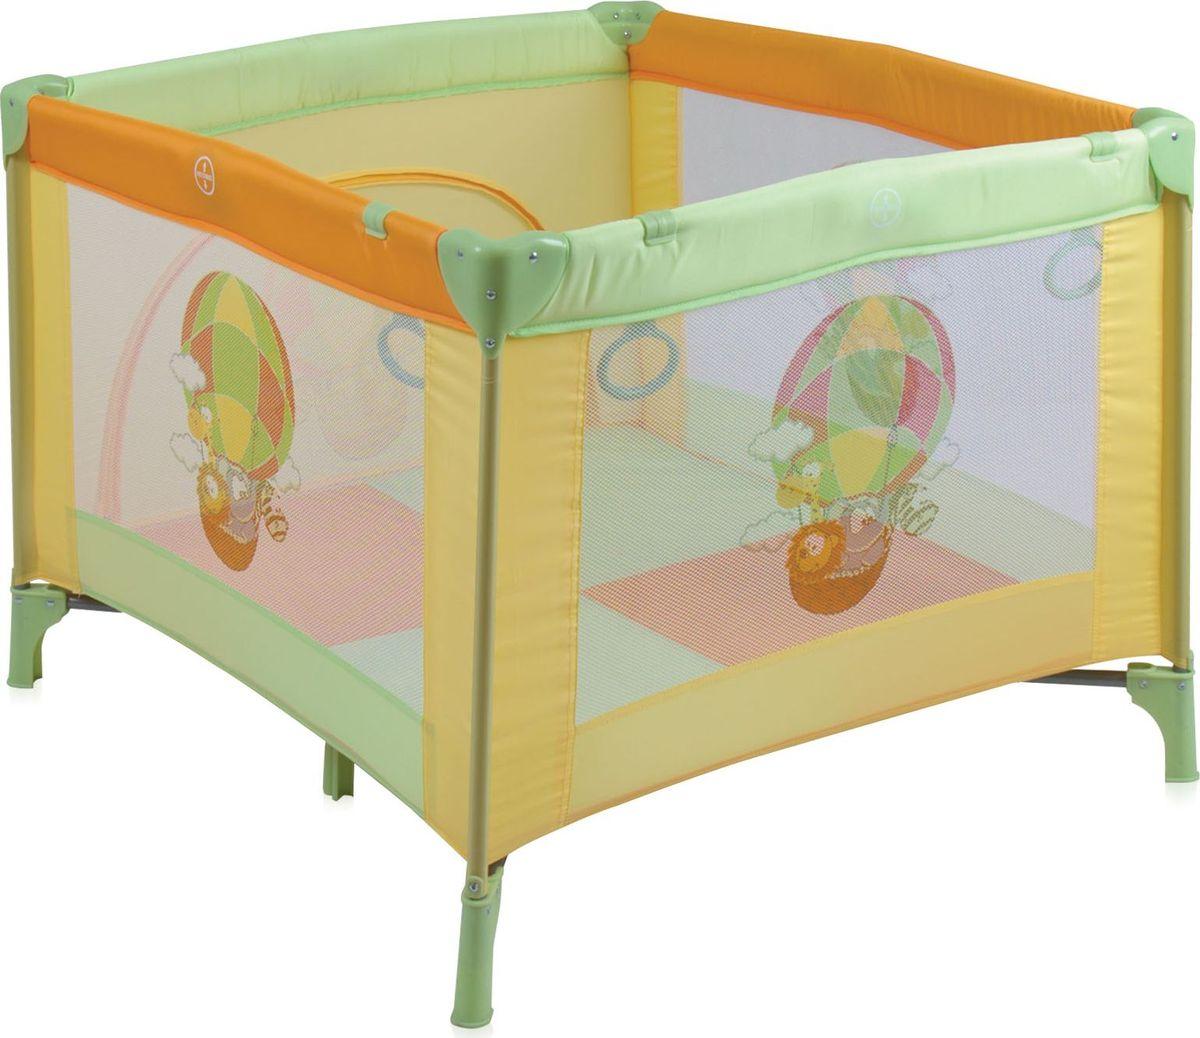 Lorelli Манеж Play Station цвет мультиколор -  Детская комната